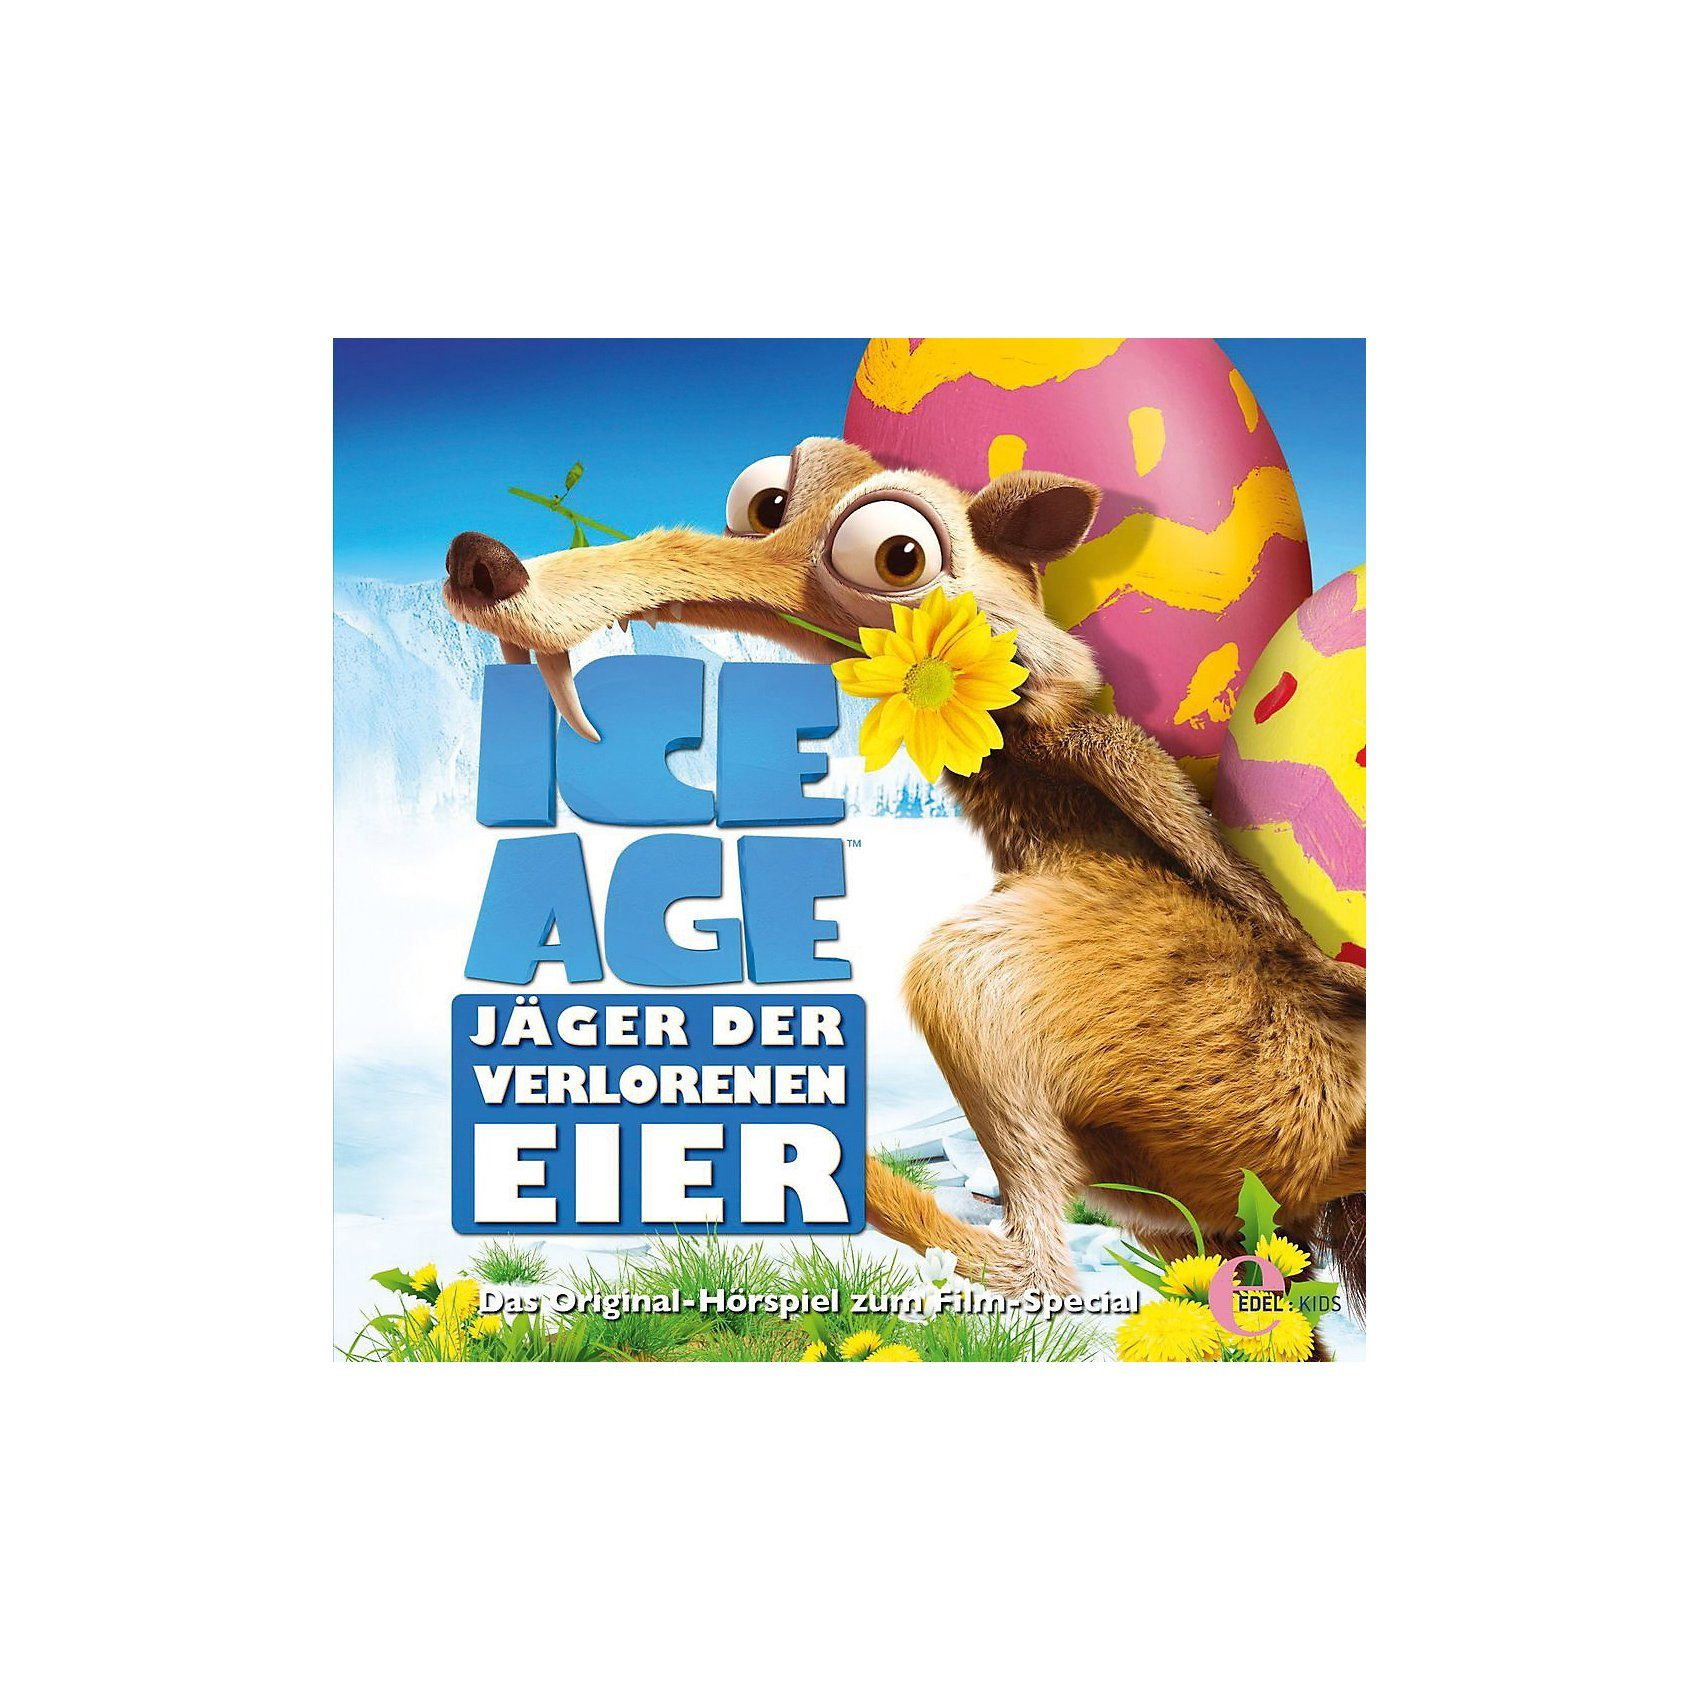 Edel CD Ice Age - Jäger der verlorenen Eier - Osterspecial (Origi